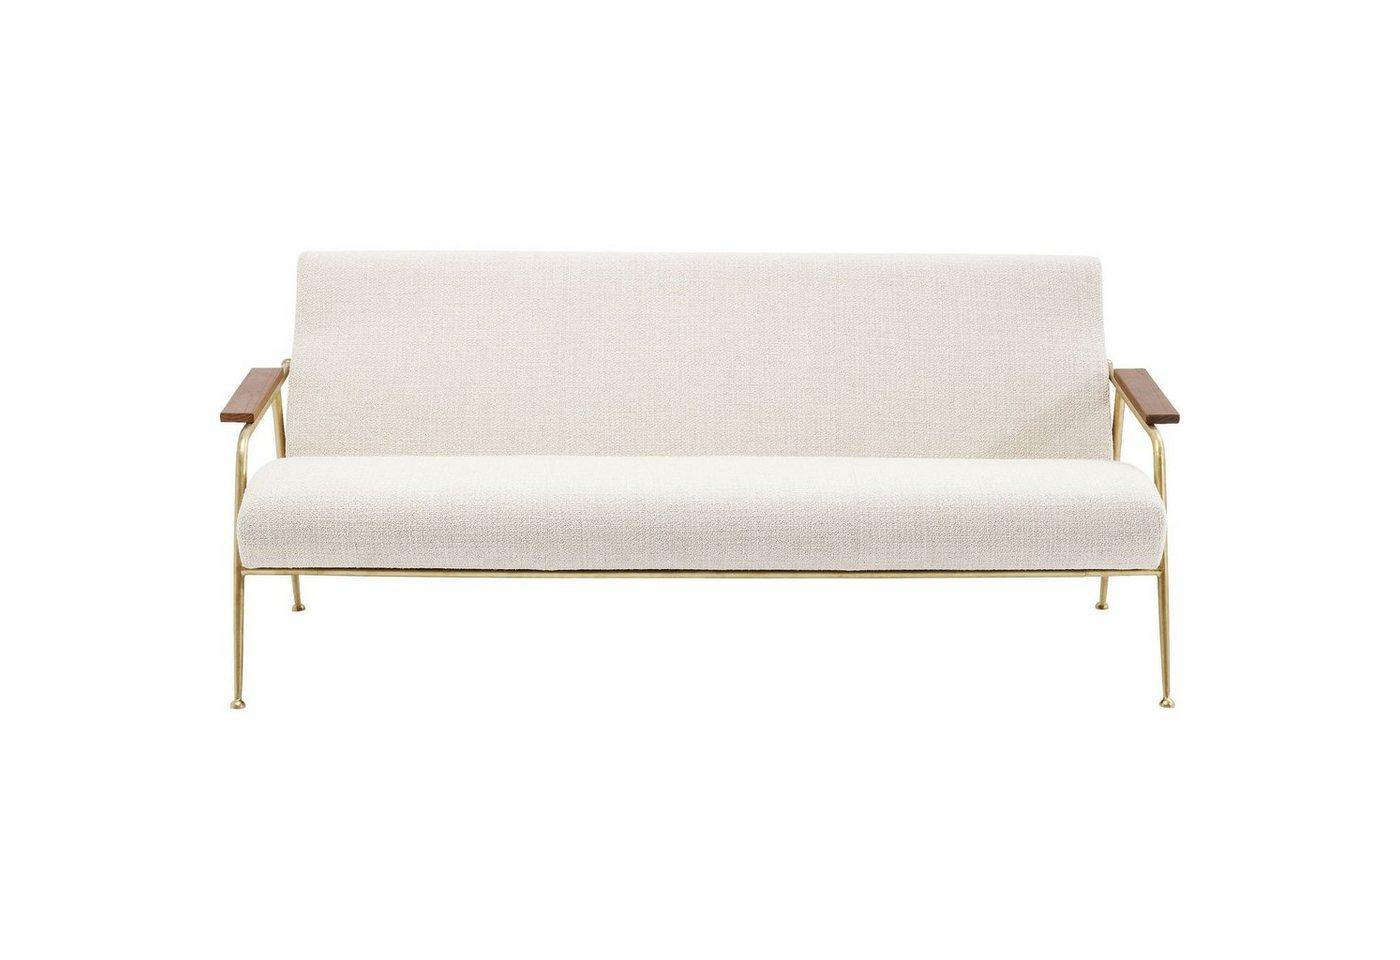 Full Size of Kare Couch Infinity Sofa Proud Design Bed Furniture List Leder Sale Topogan Karup Garten Ecksofa 2 Sitzer Kaufen Günstig Stoff Big Kolonialstil Led Goodlife Sofa Kare Sofa